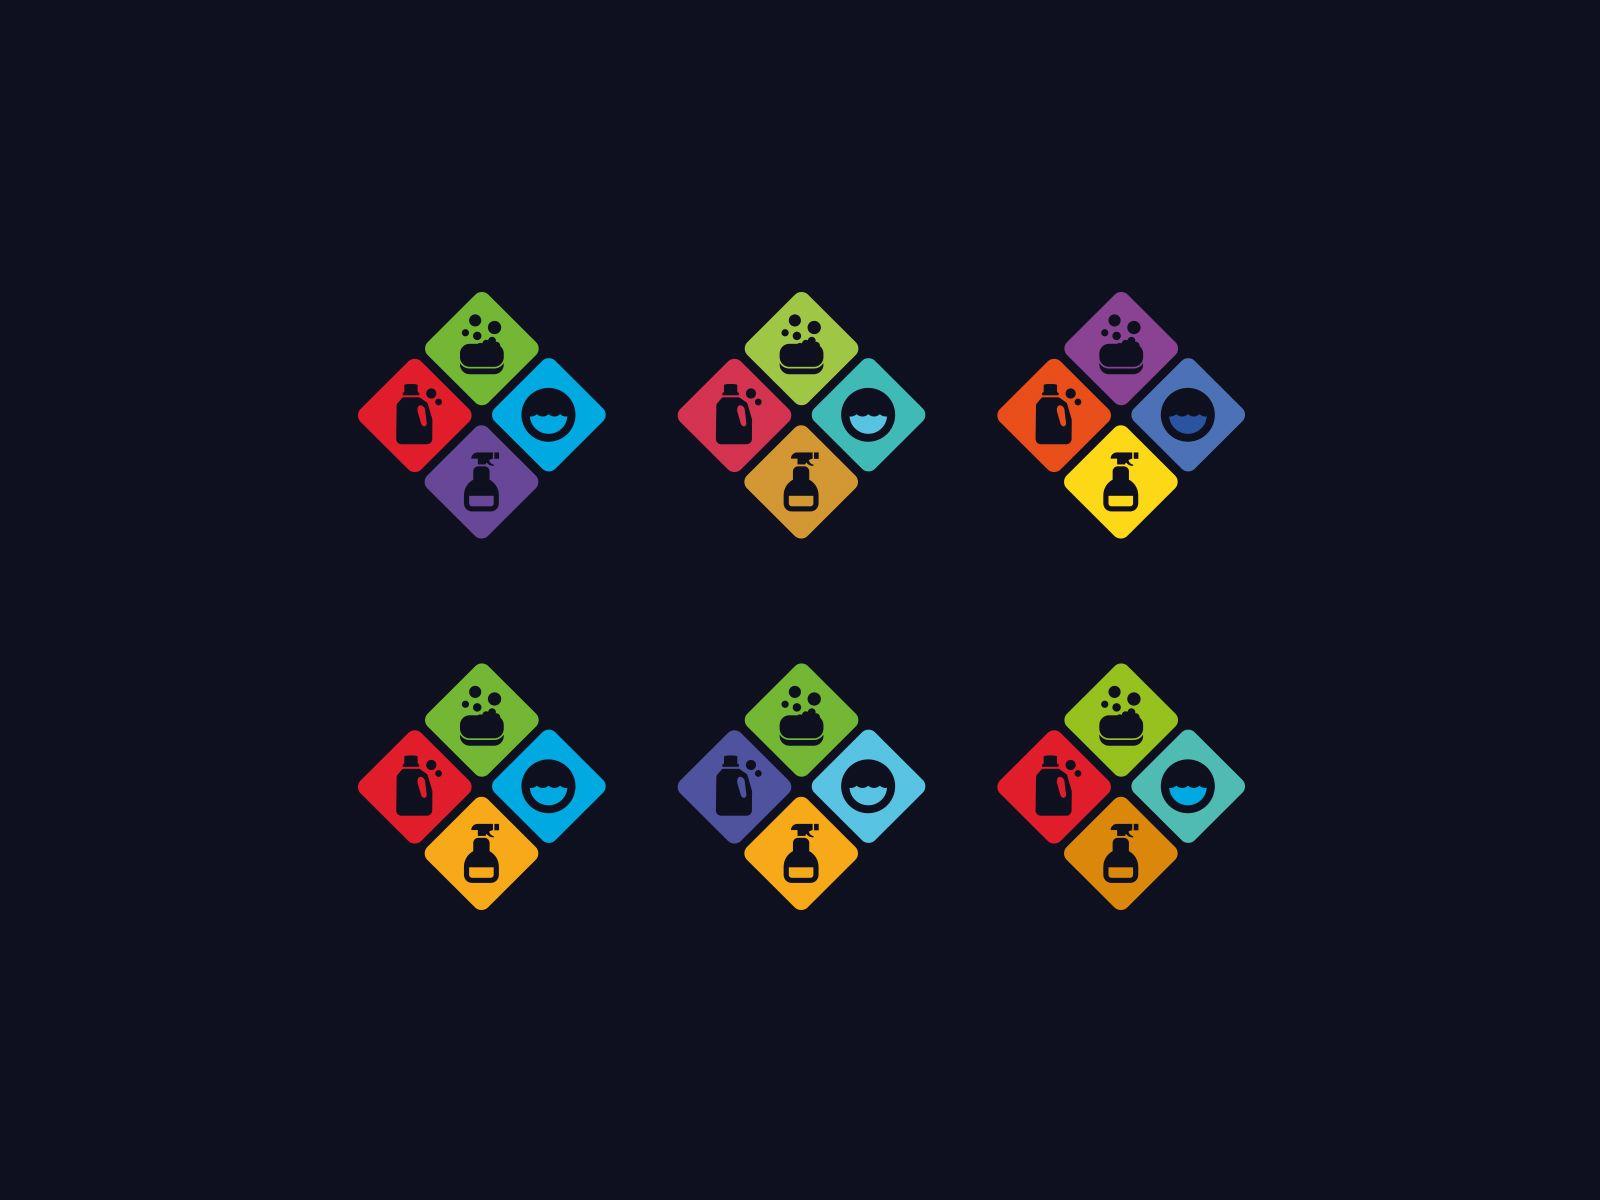 Логотип для ХозМаг - дизайнер U4po4mak